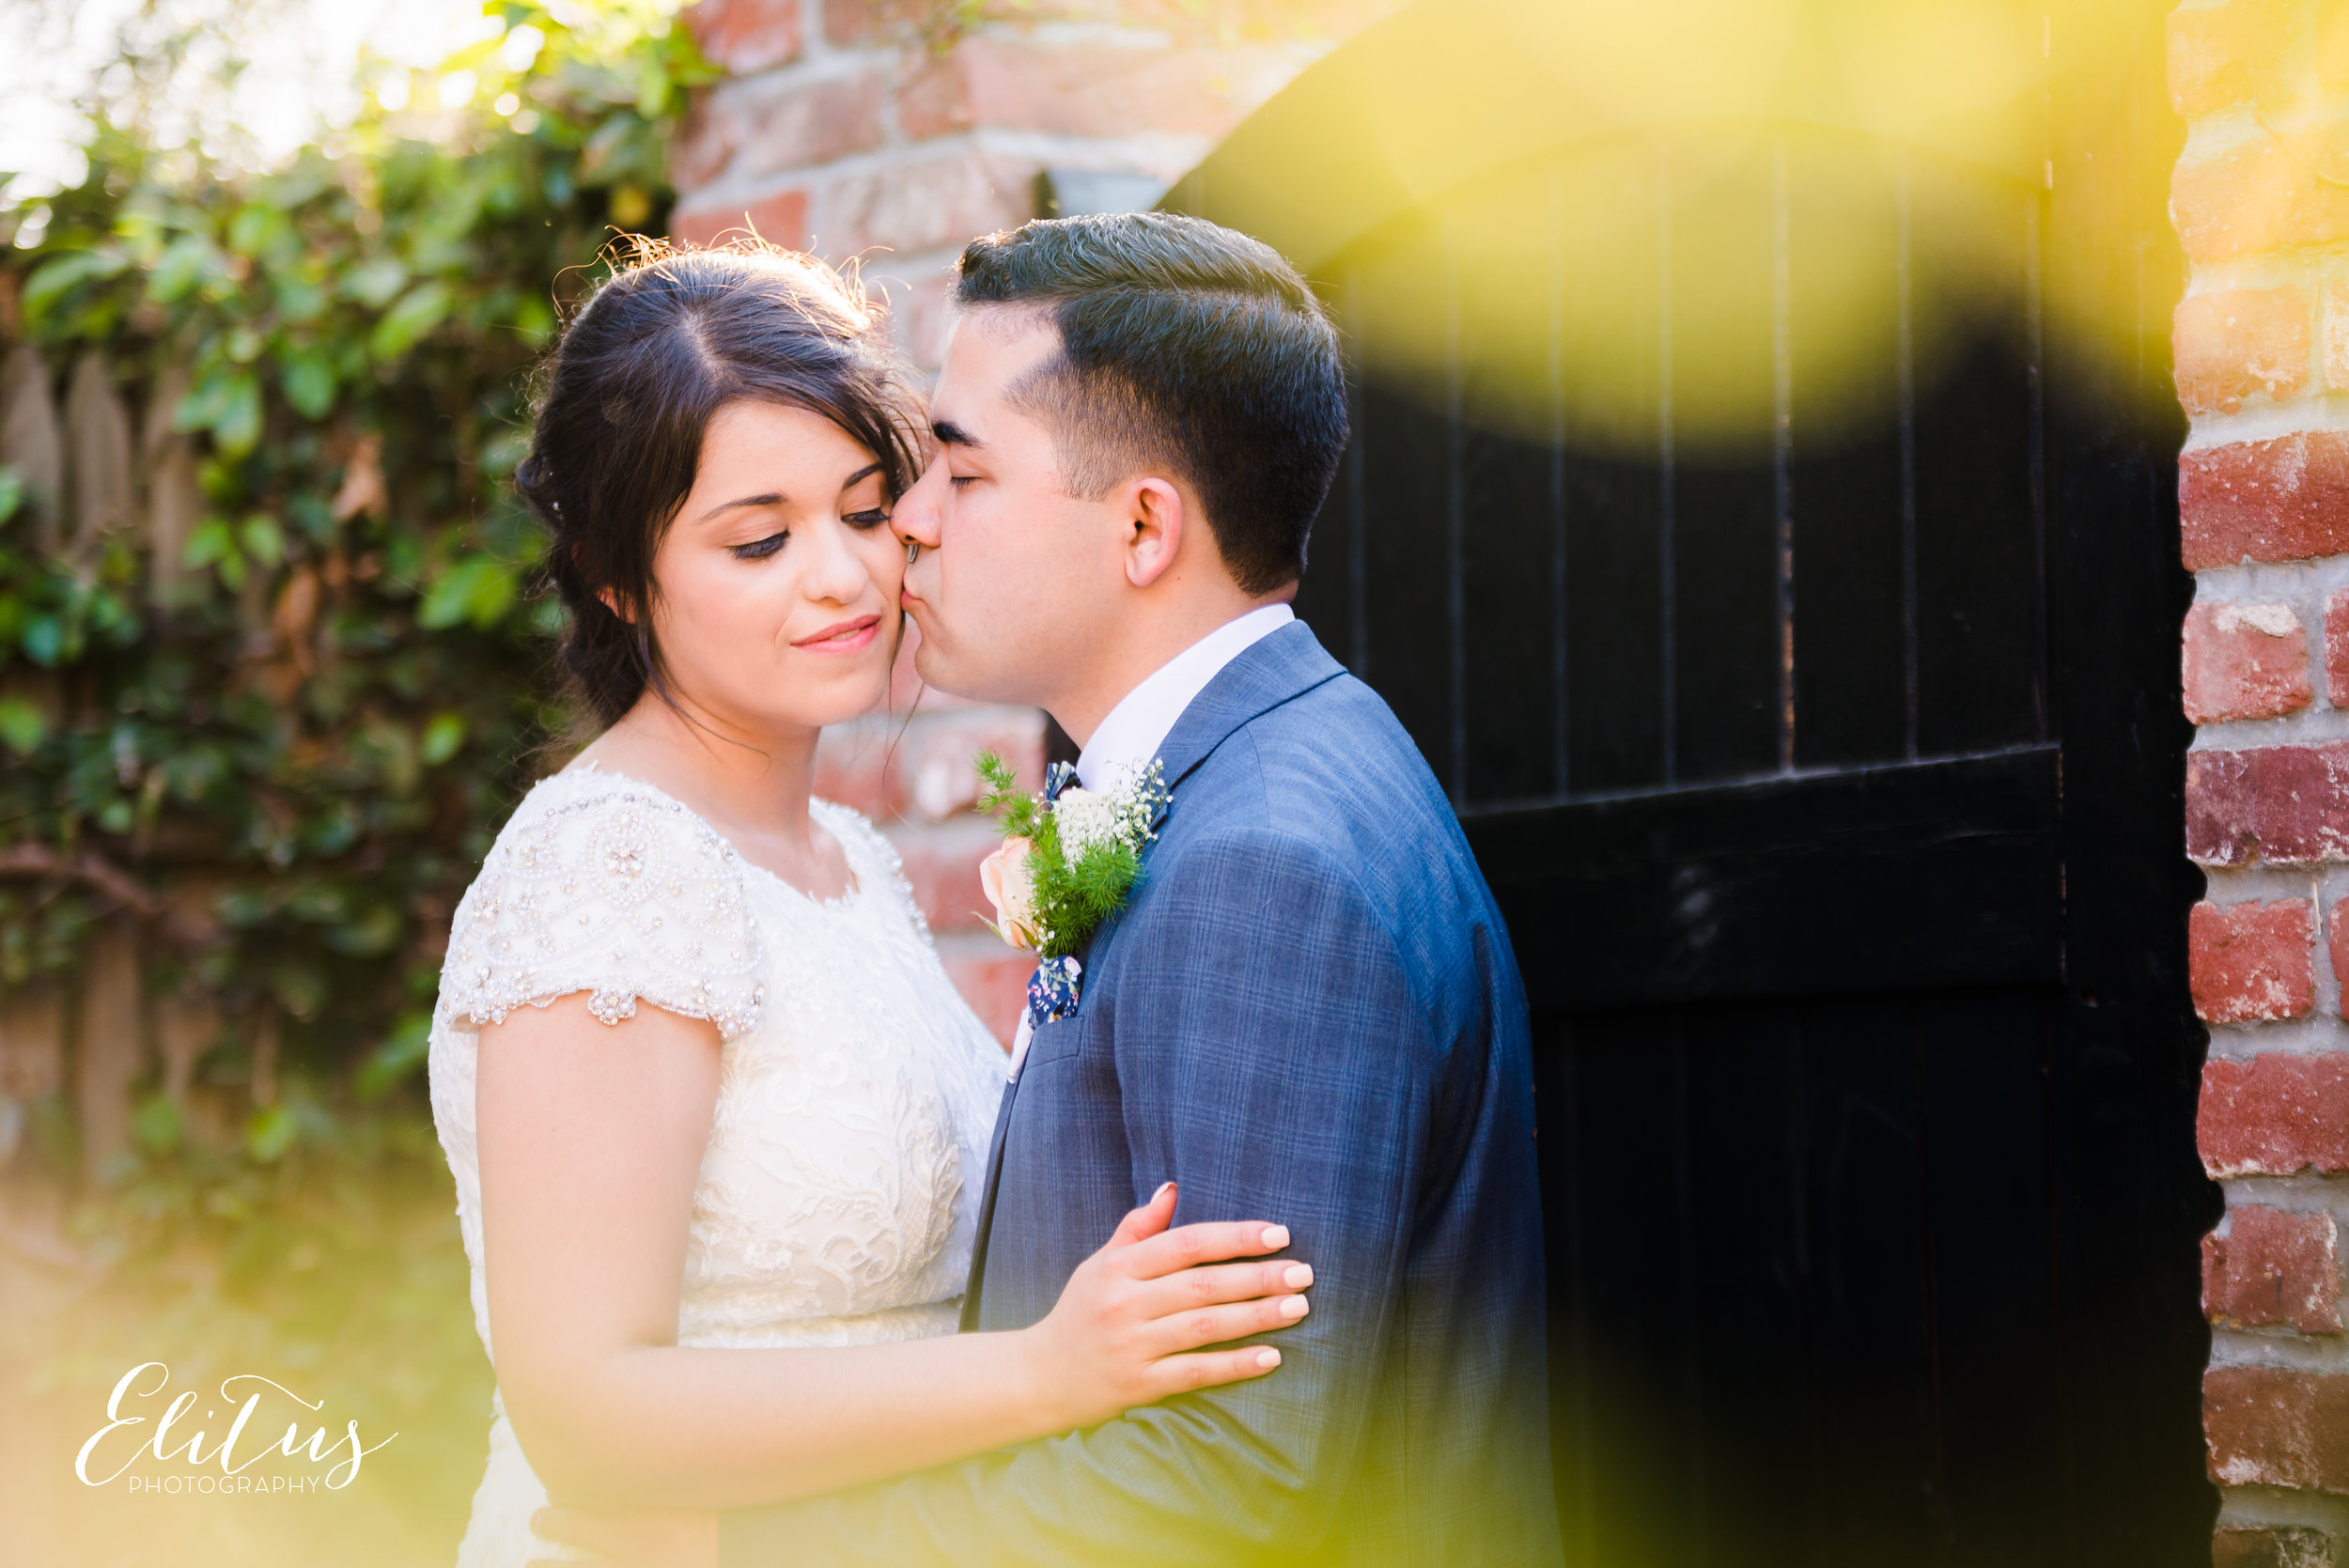 elitus-photography-rigo&yvette-wedding (32 of 81).jpg